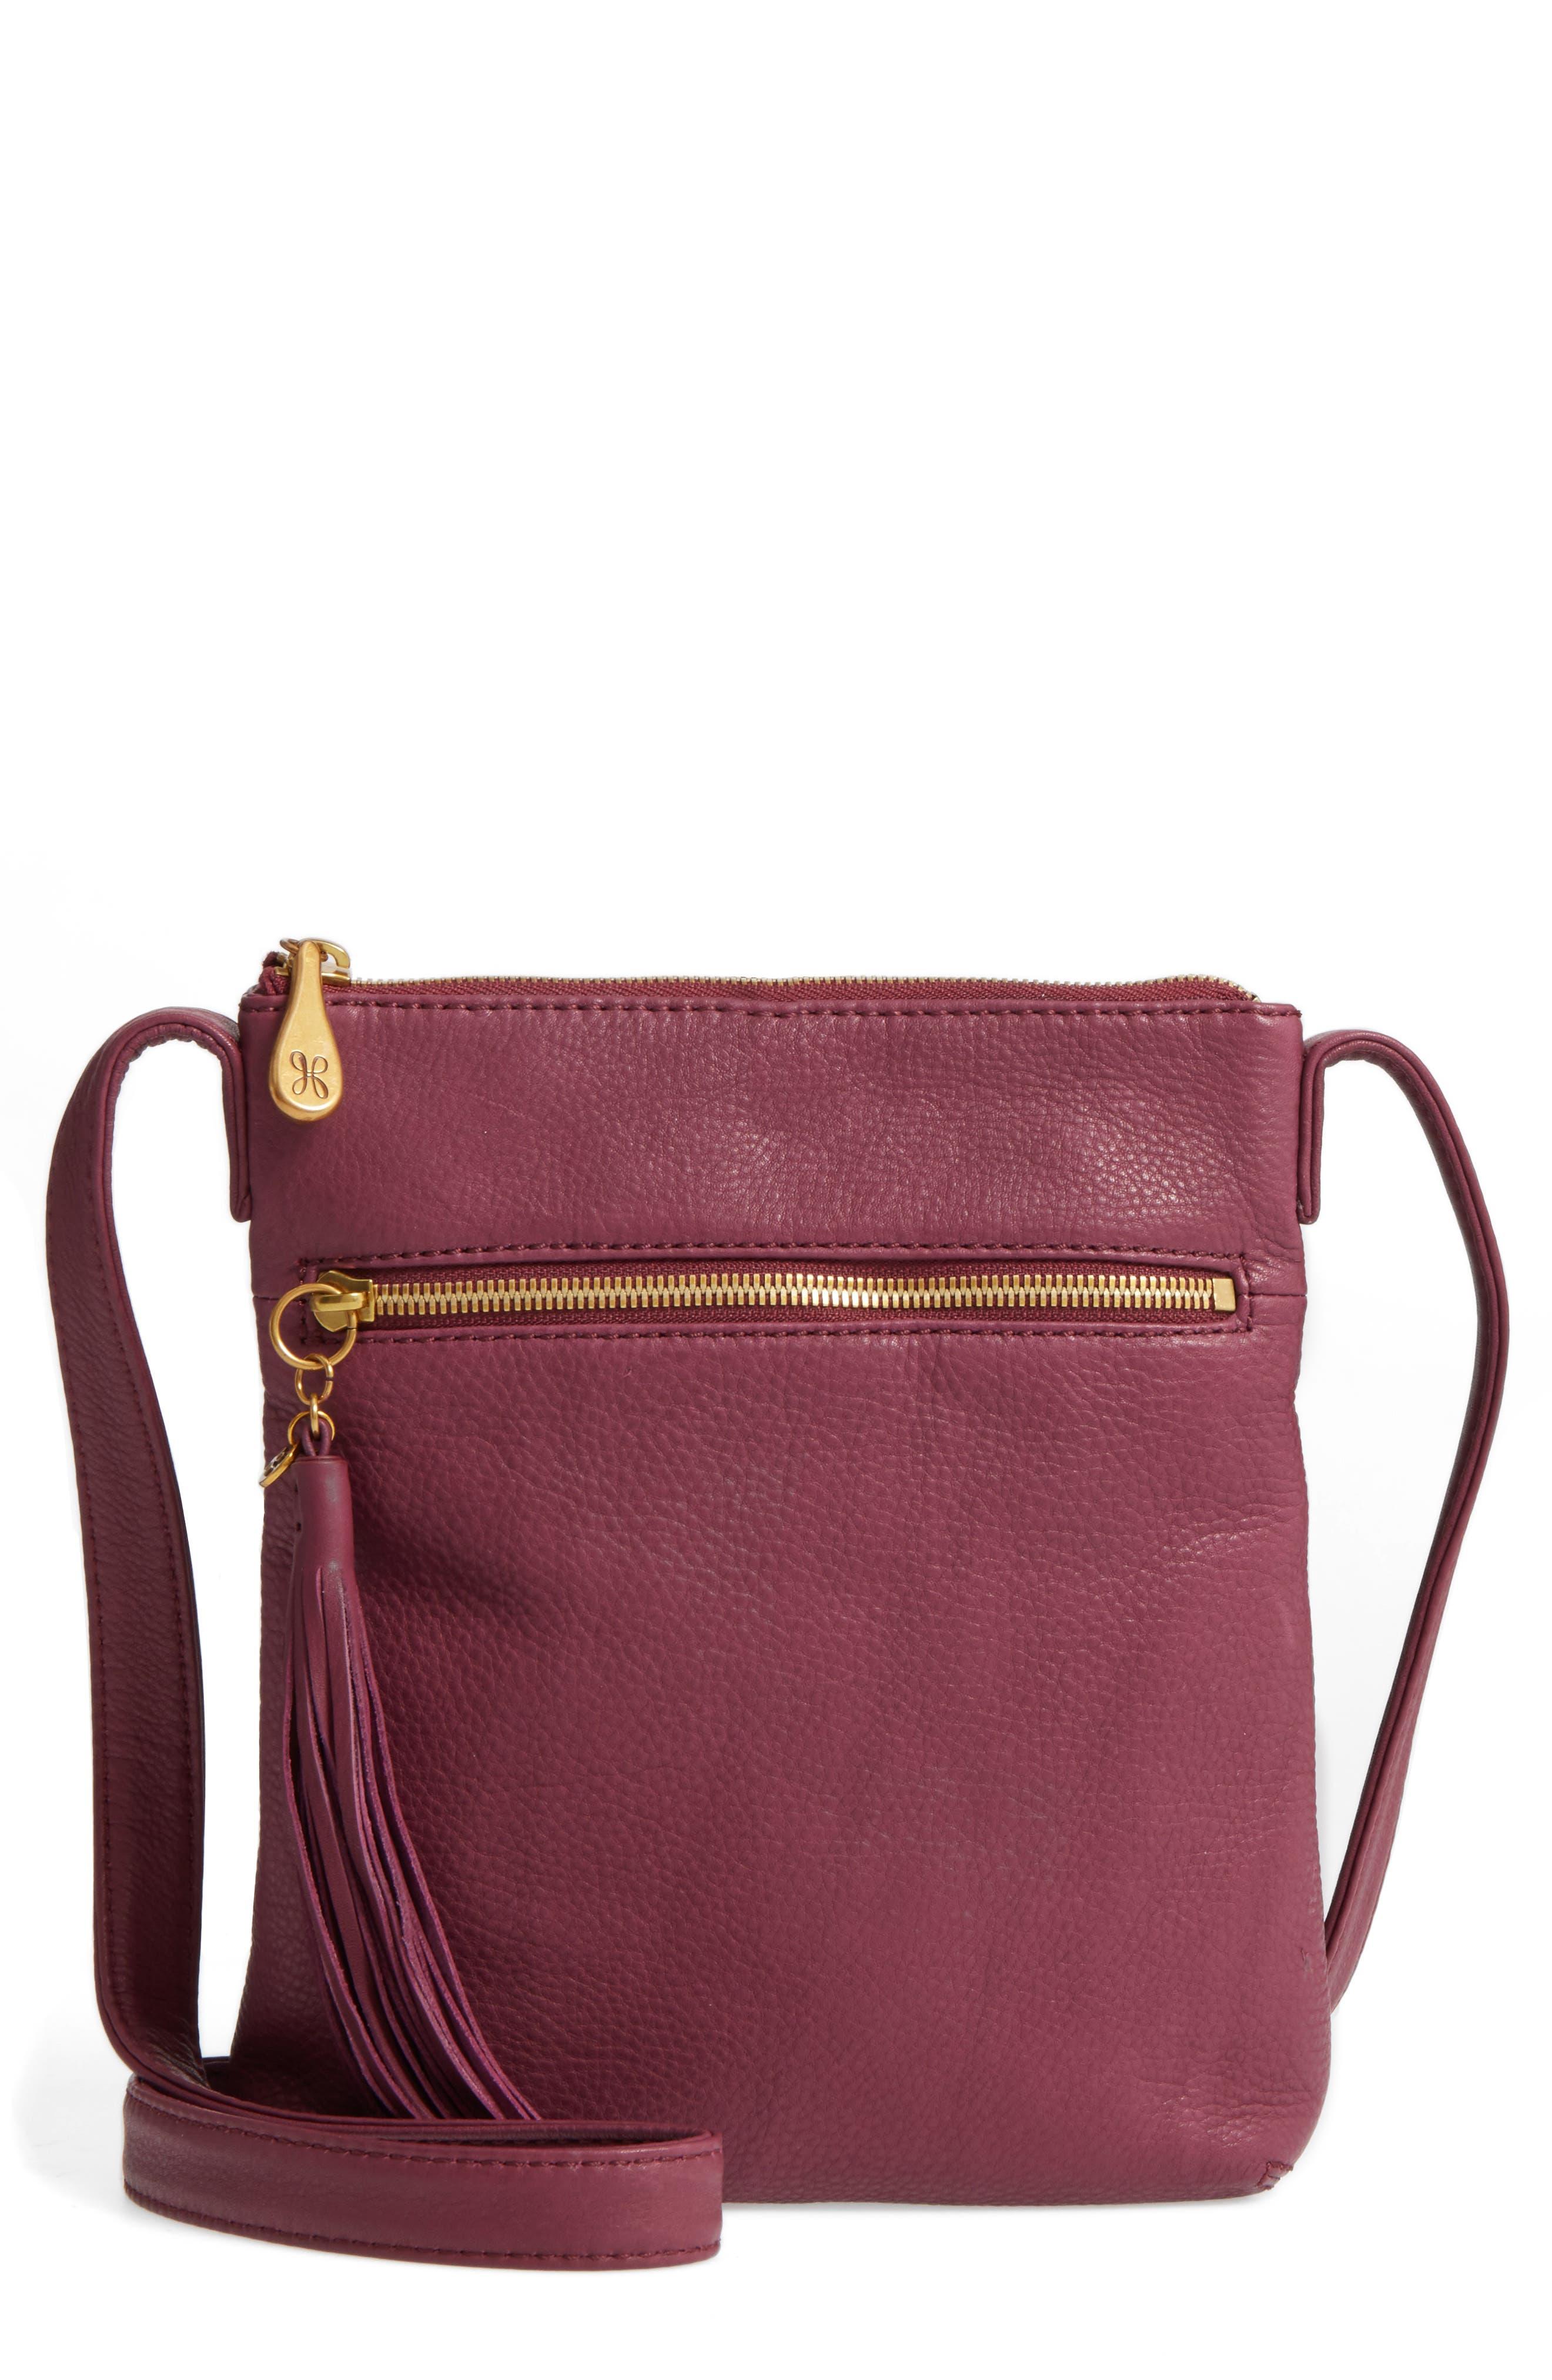 Alternate Image 1 Selected - Hobo 'Sarah' Leather Crossbody Bag